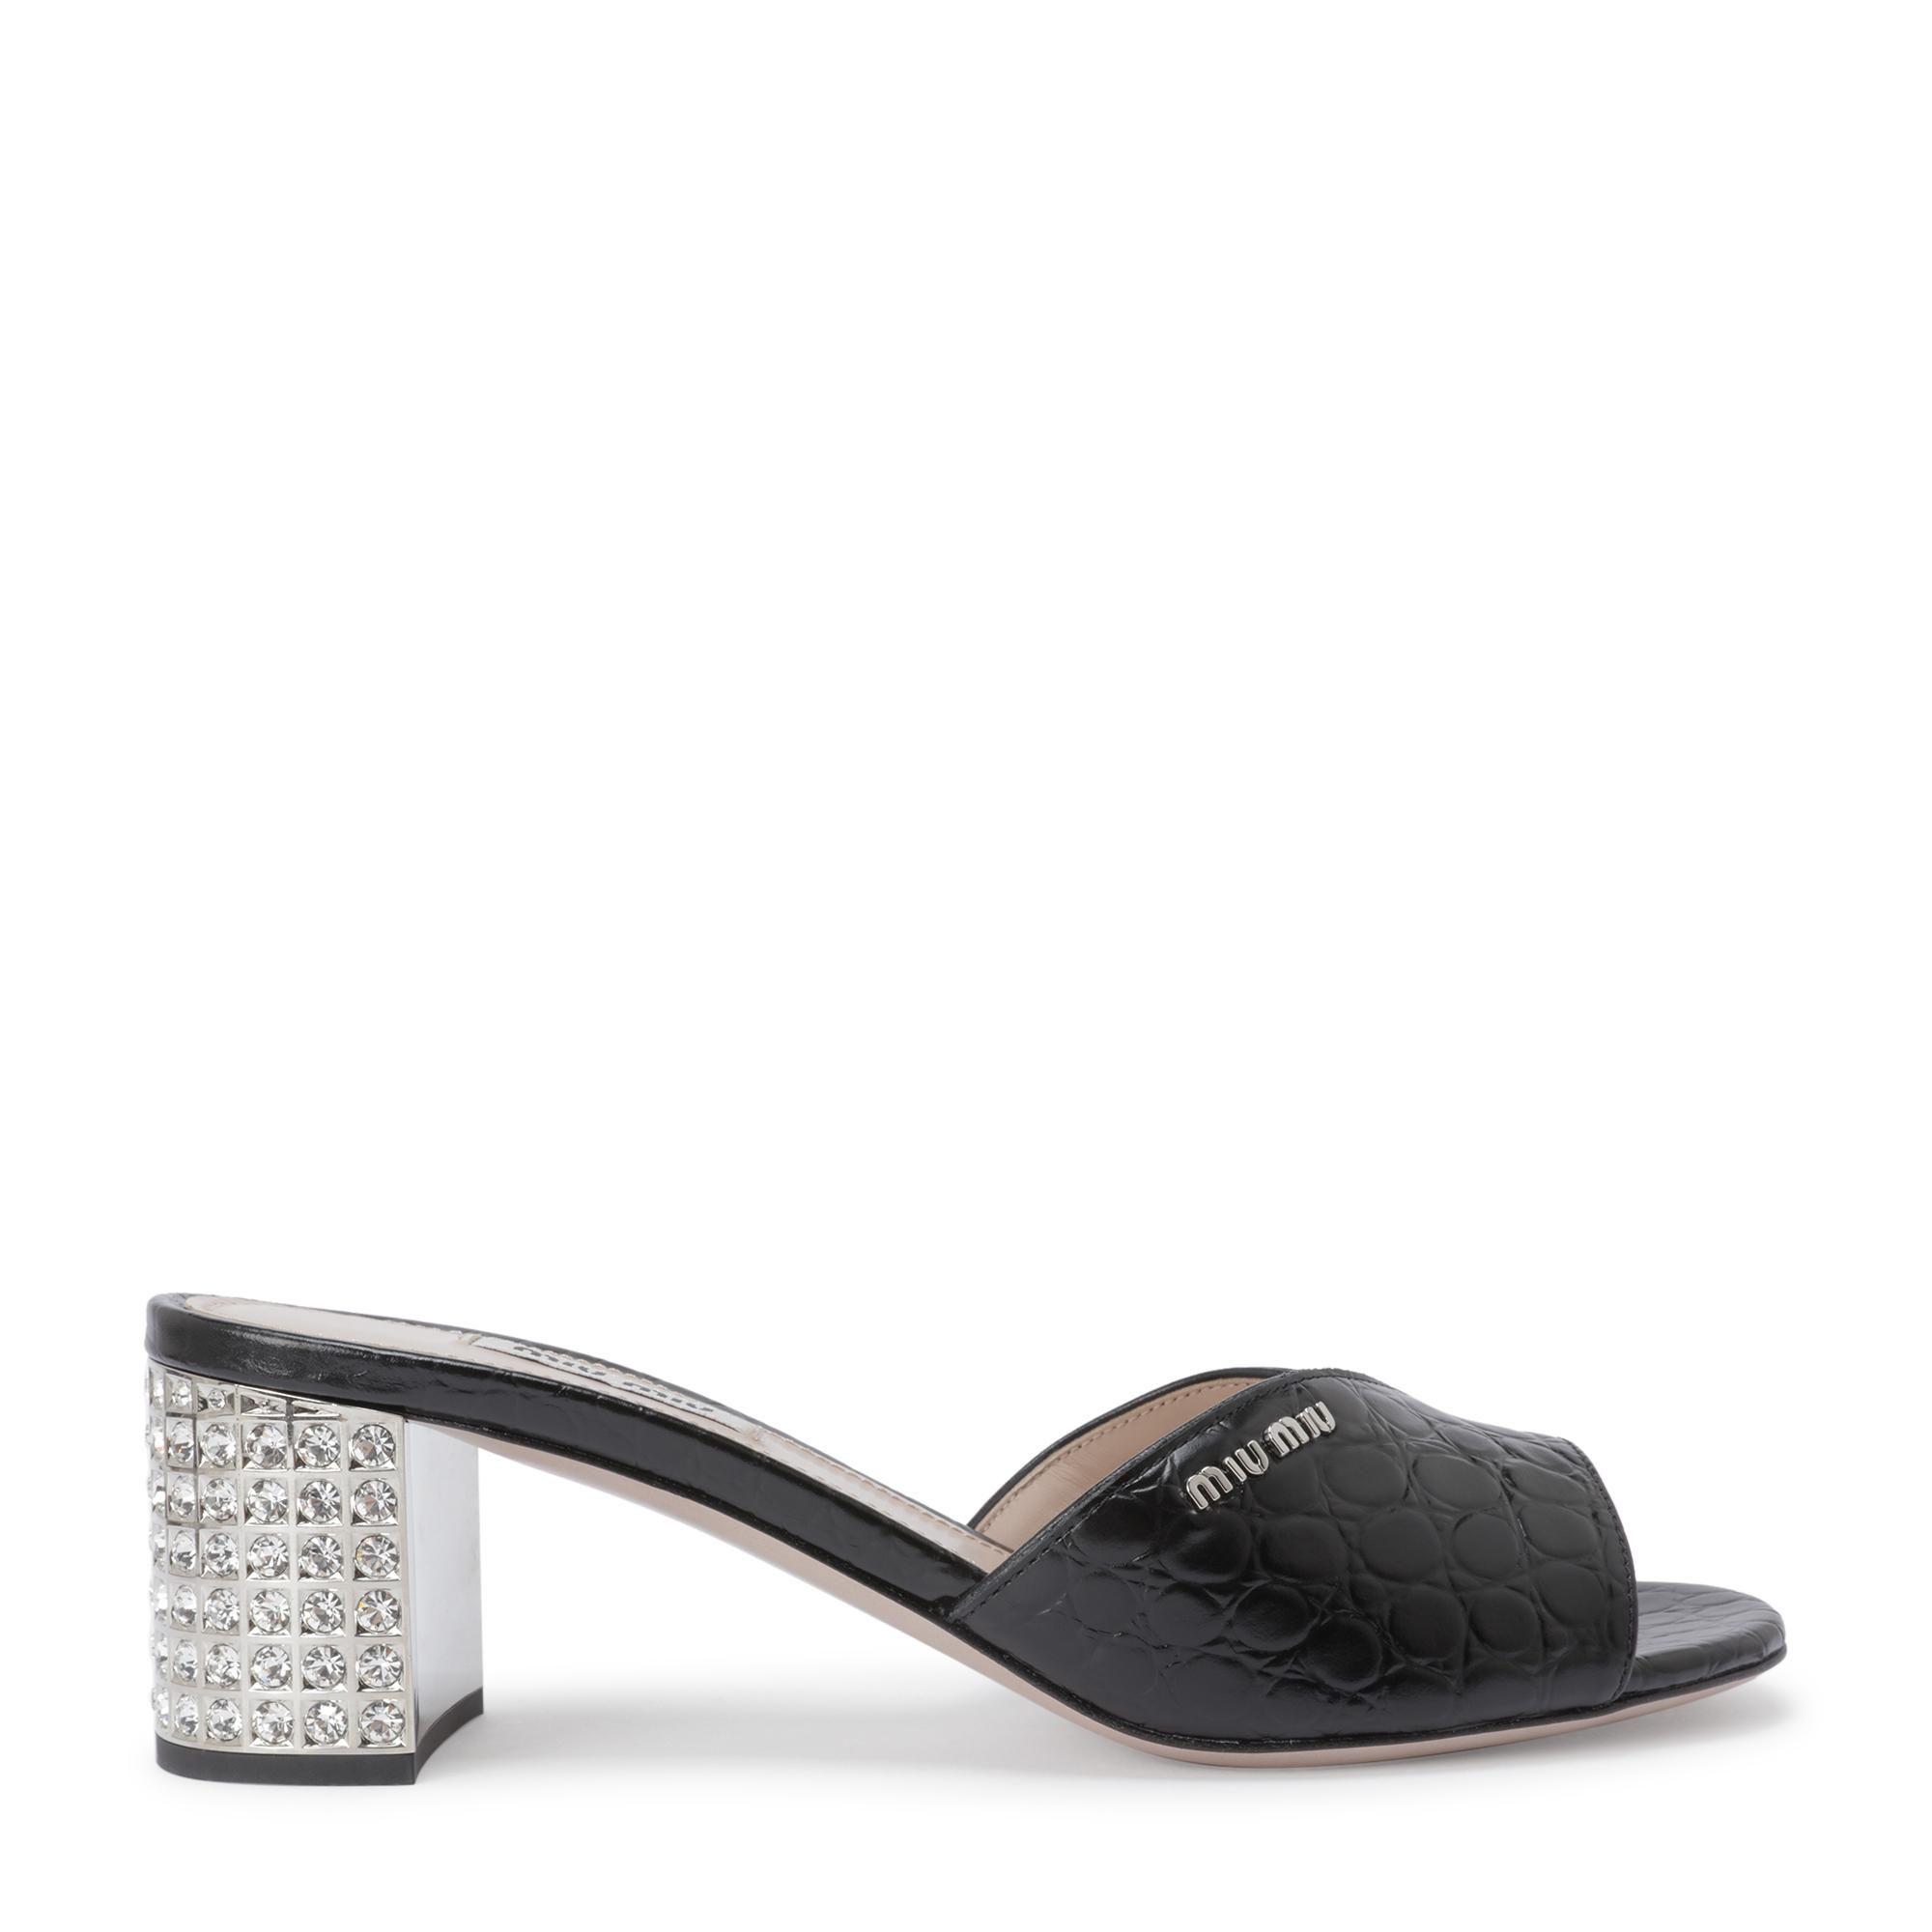 Croc-embossed leather sandals